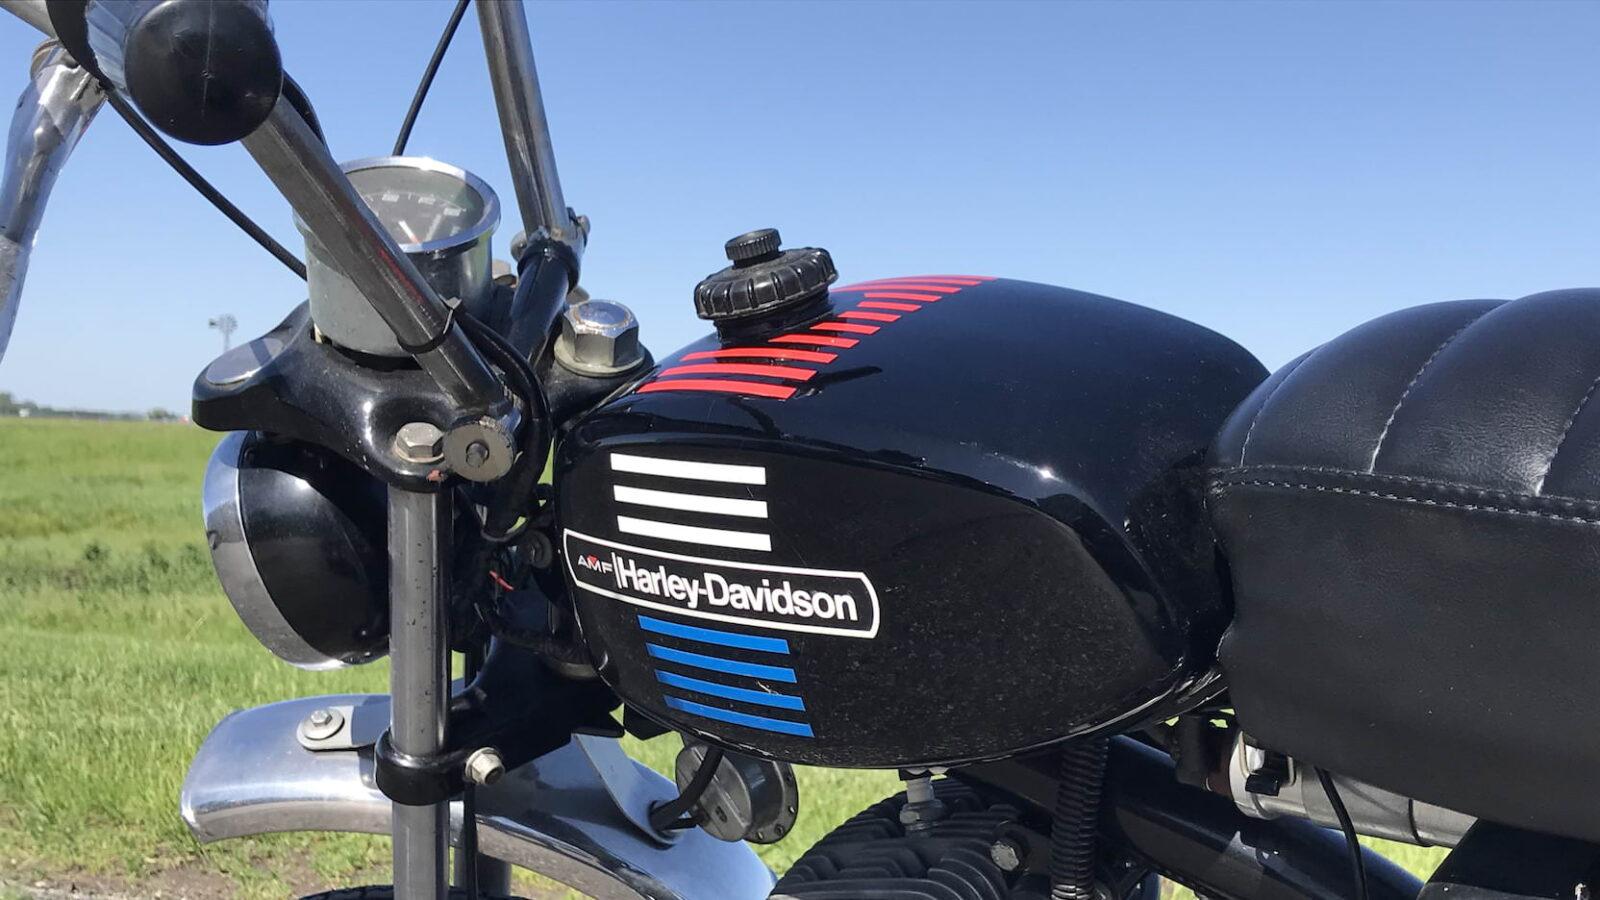 Harley-Davidson X-90 - The Shortster 8